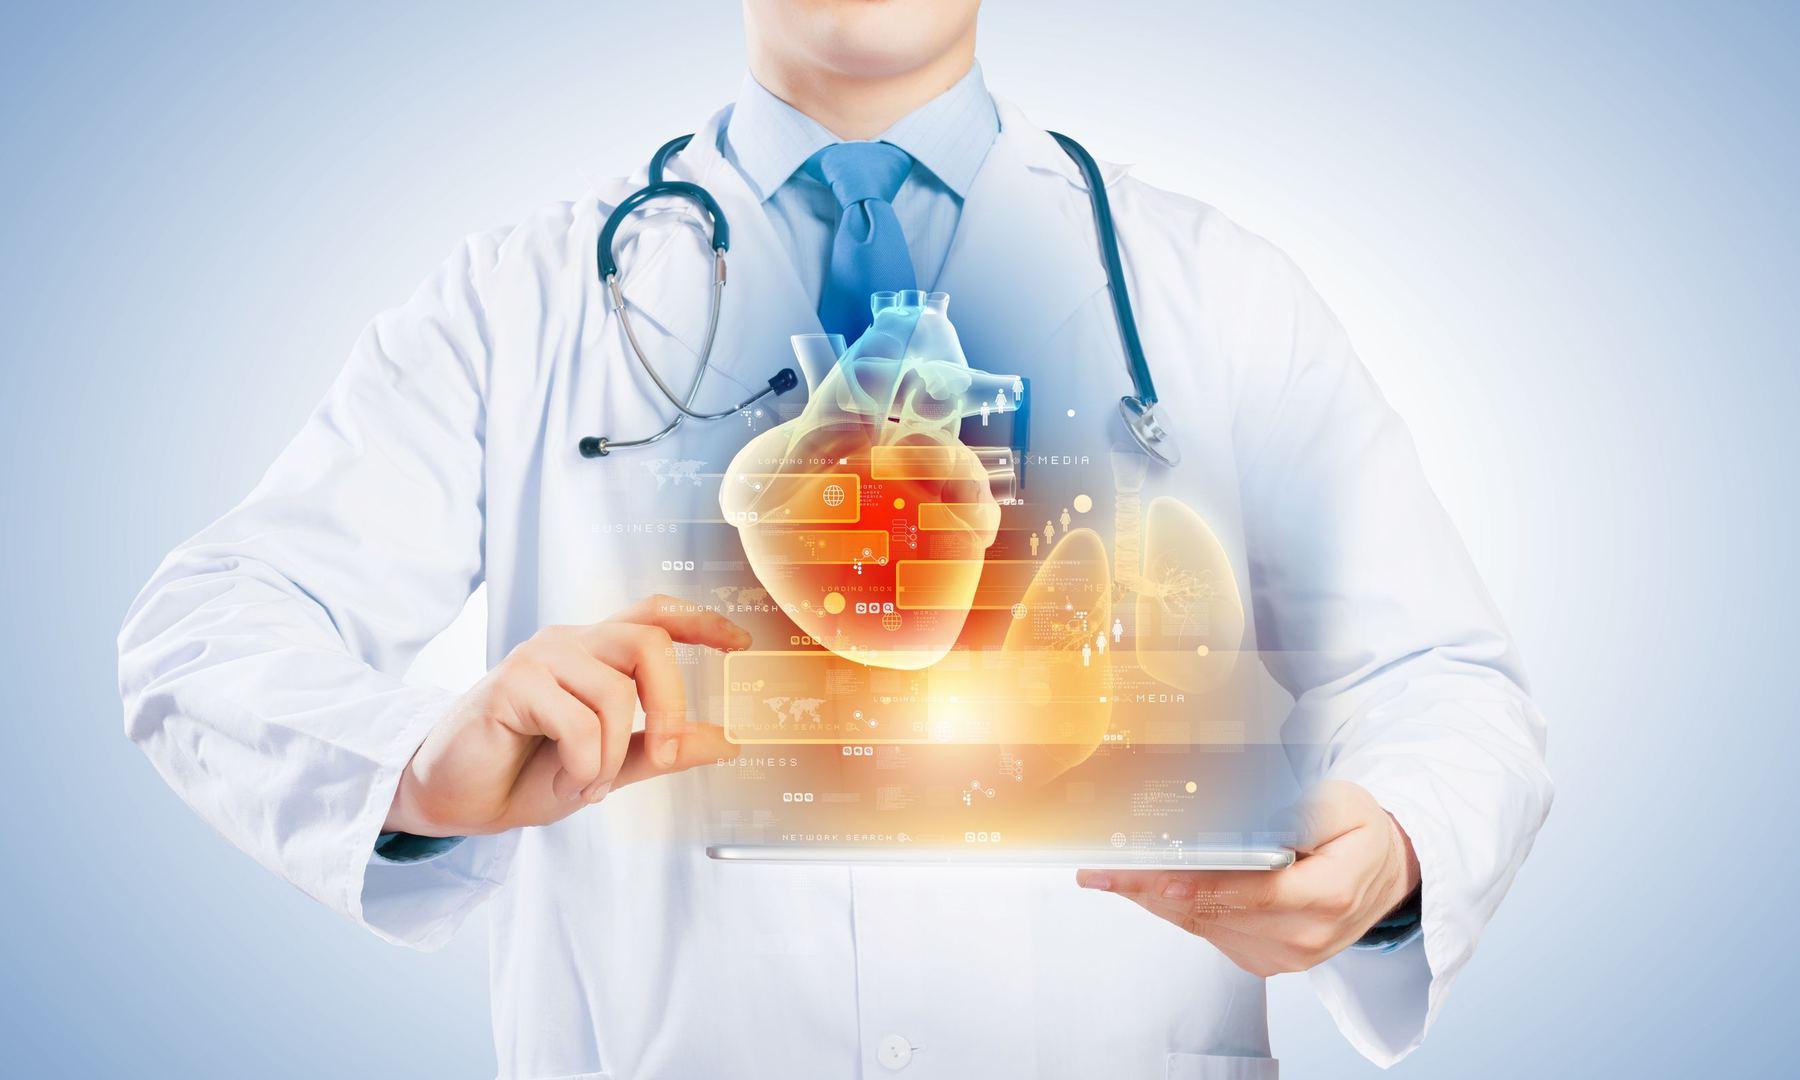 benecol šviesos ir širdies sveikata 3 stadijos hipertenzijos kriterijai